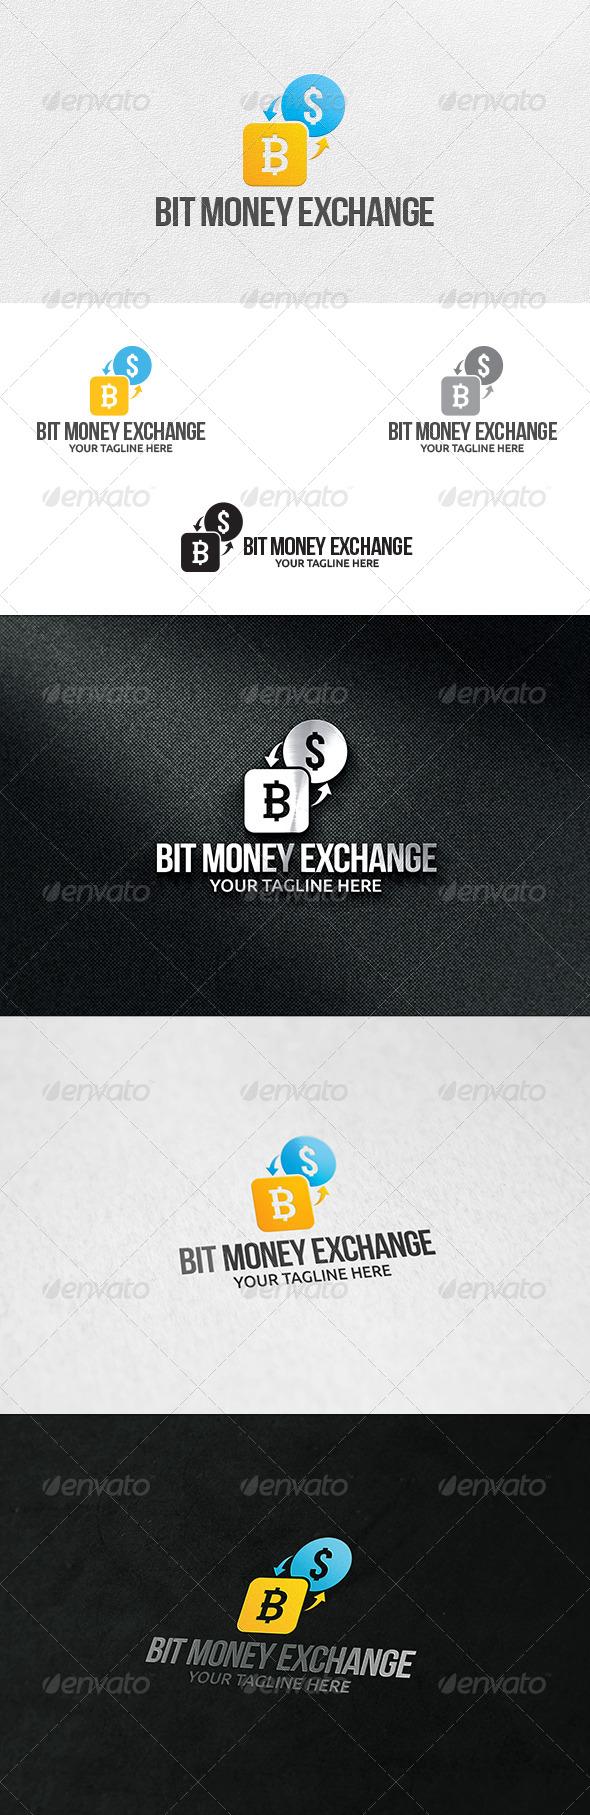 GraphicRiver Bit Money Exchange Logo Template 6610398